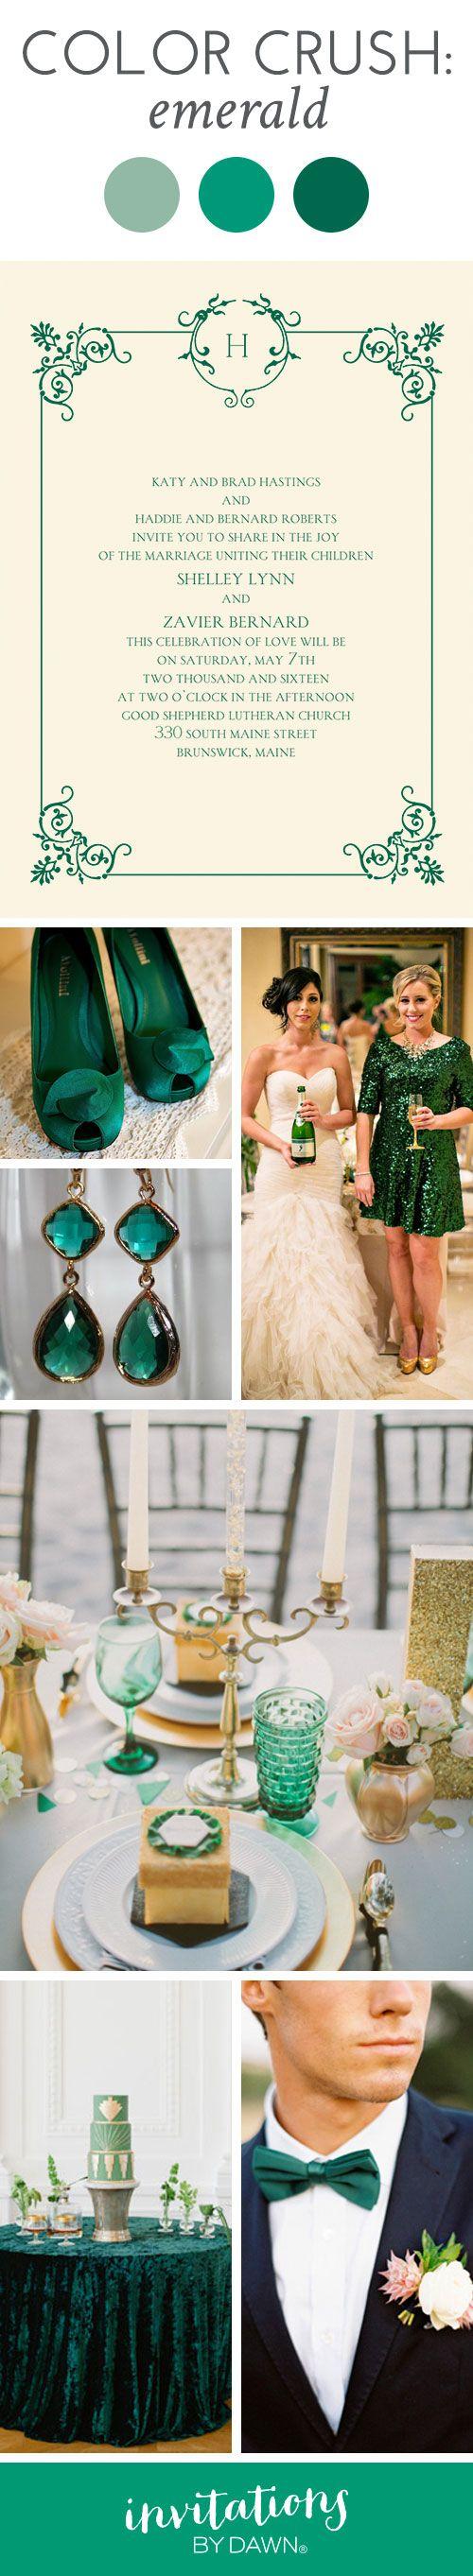 Wedding Color Crush: Emerald